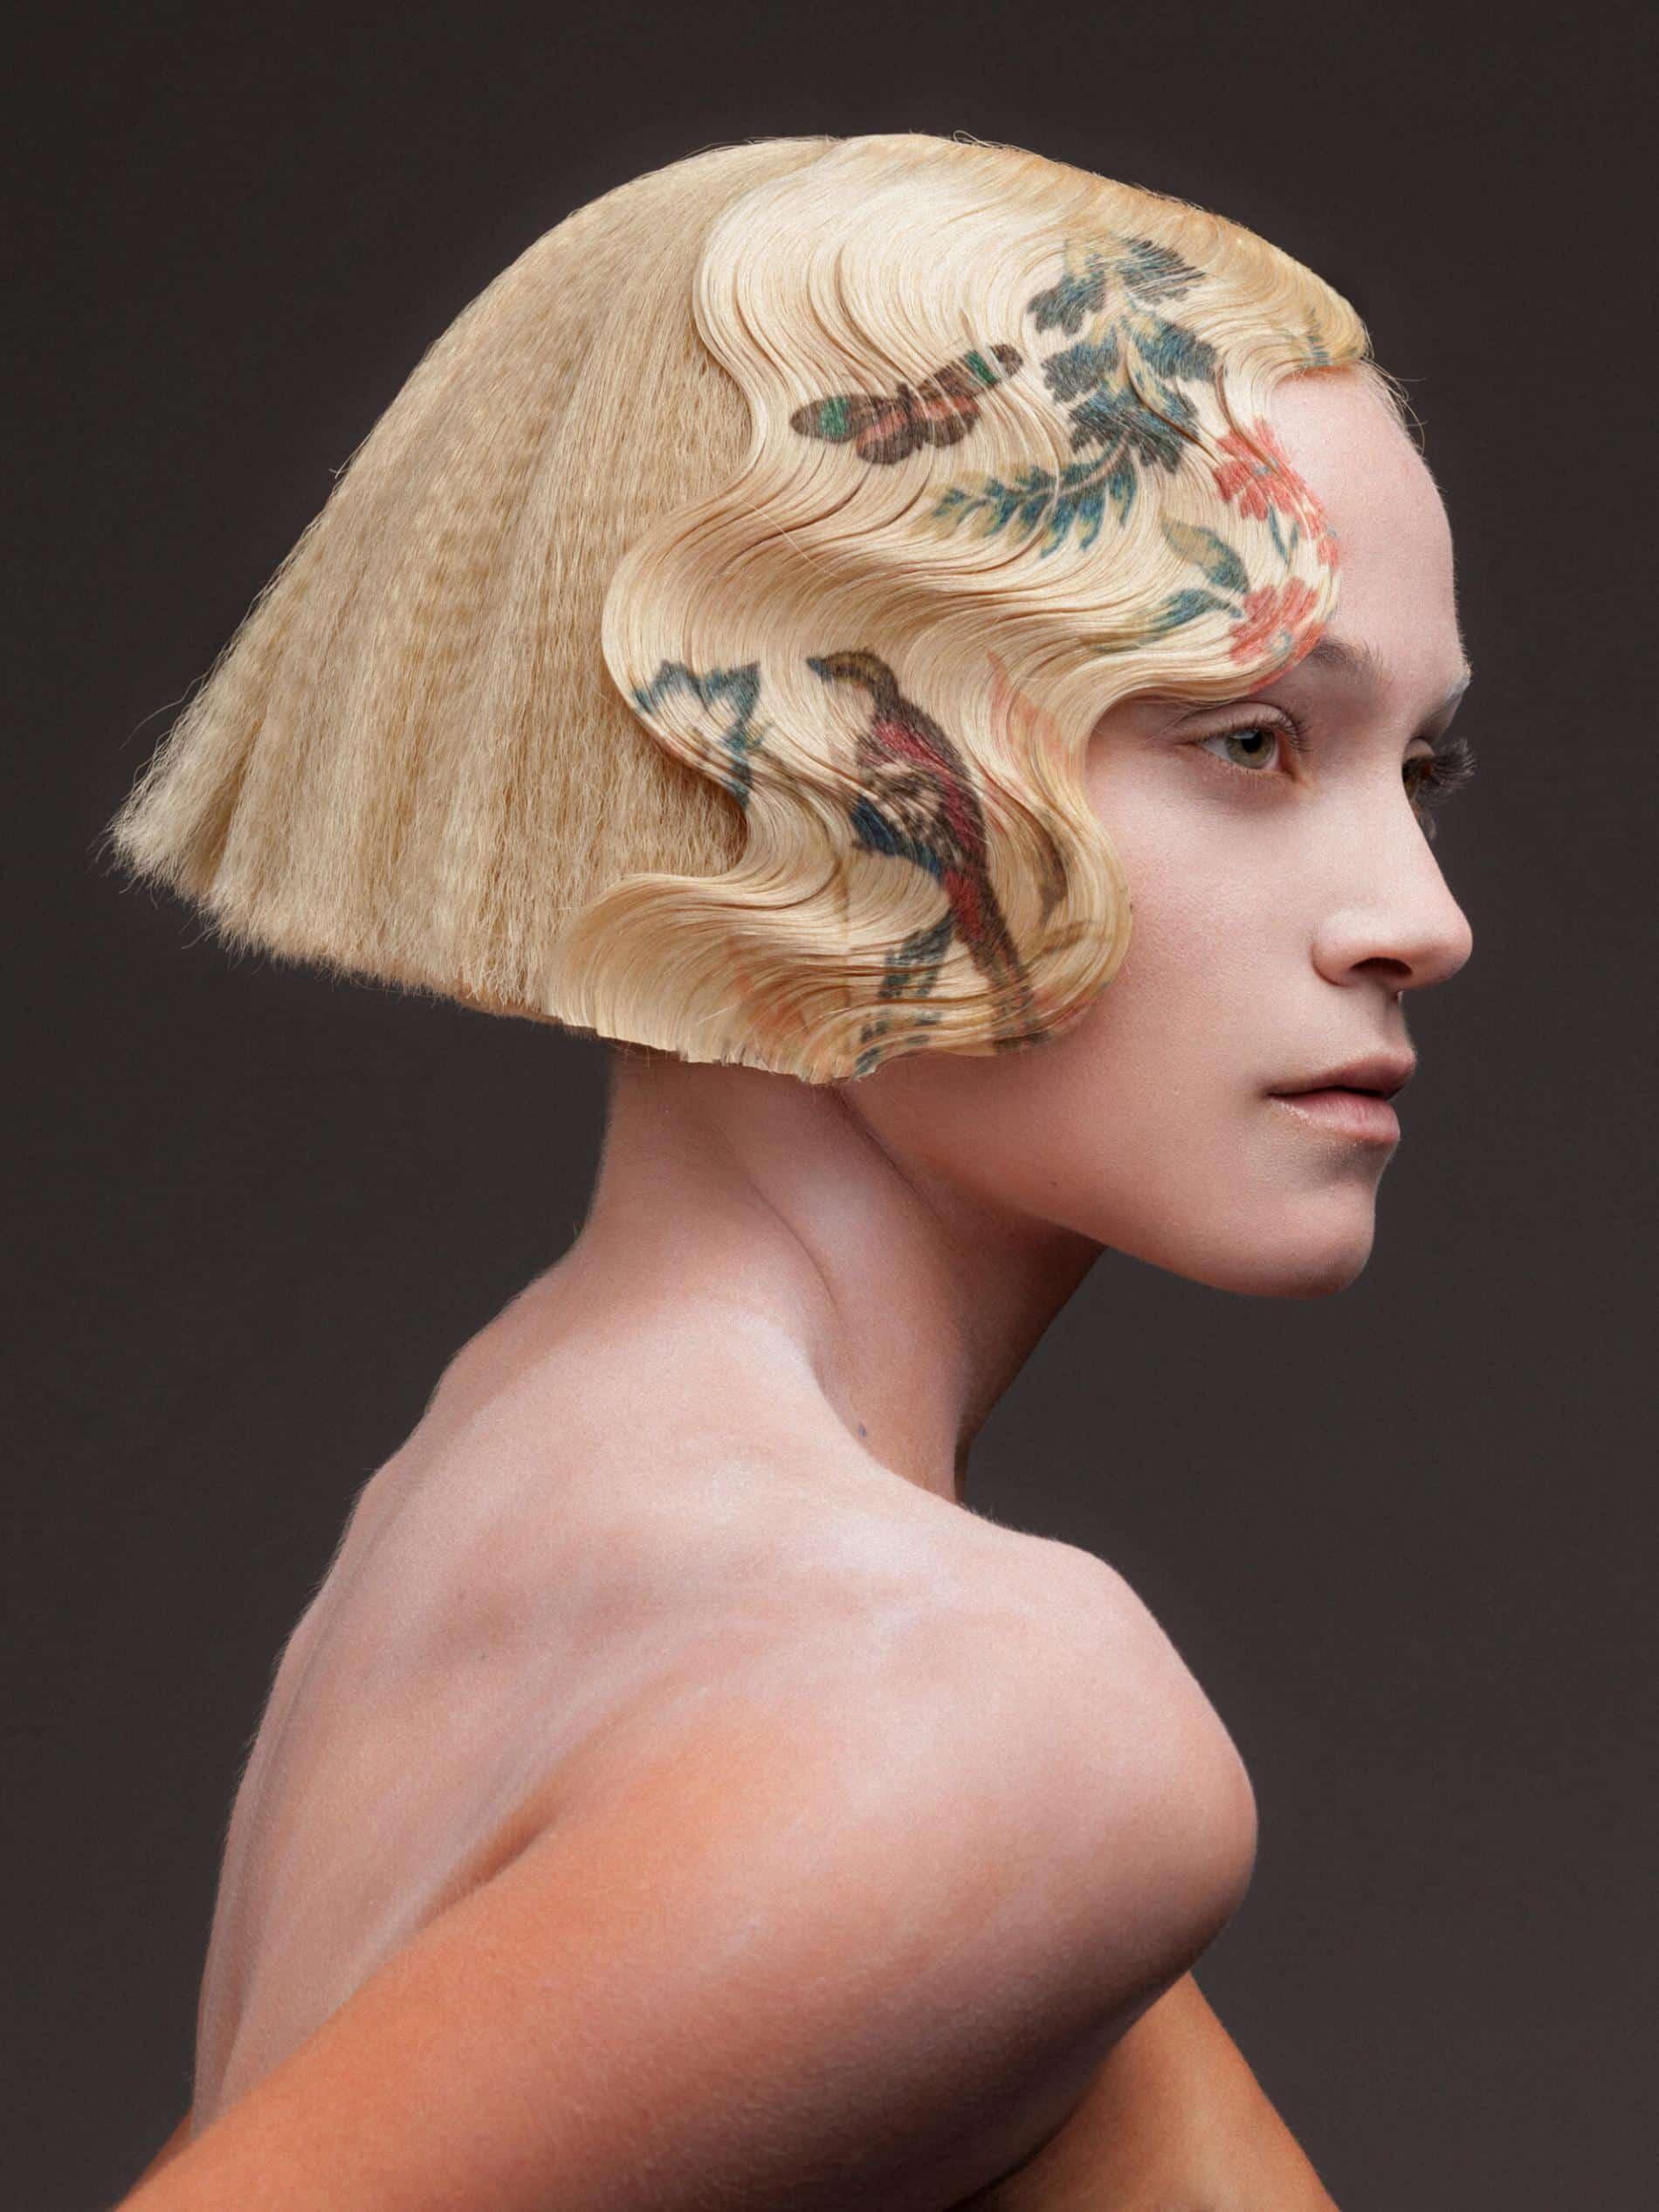 alexis ferrer impresion digital peinados con arte